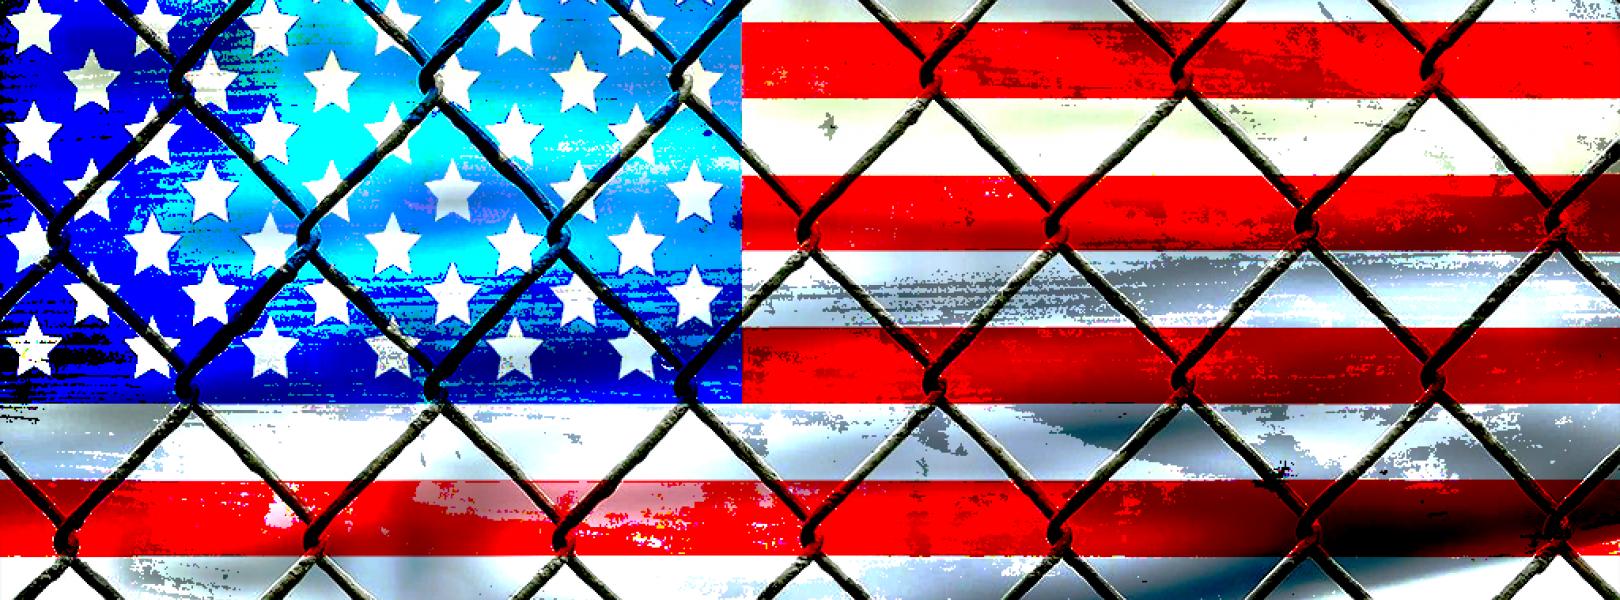 U.S. flag behind caged bars